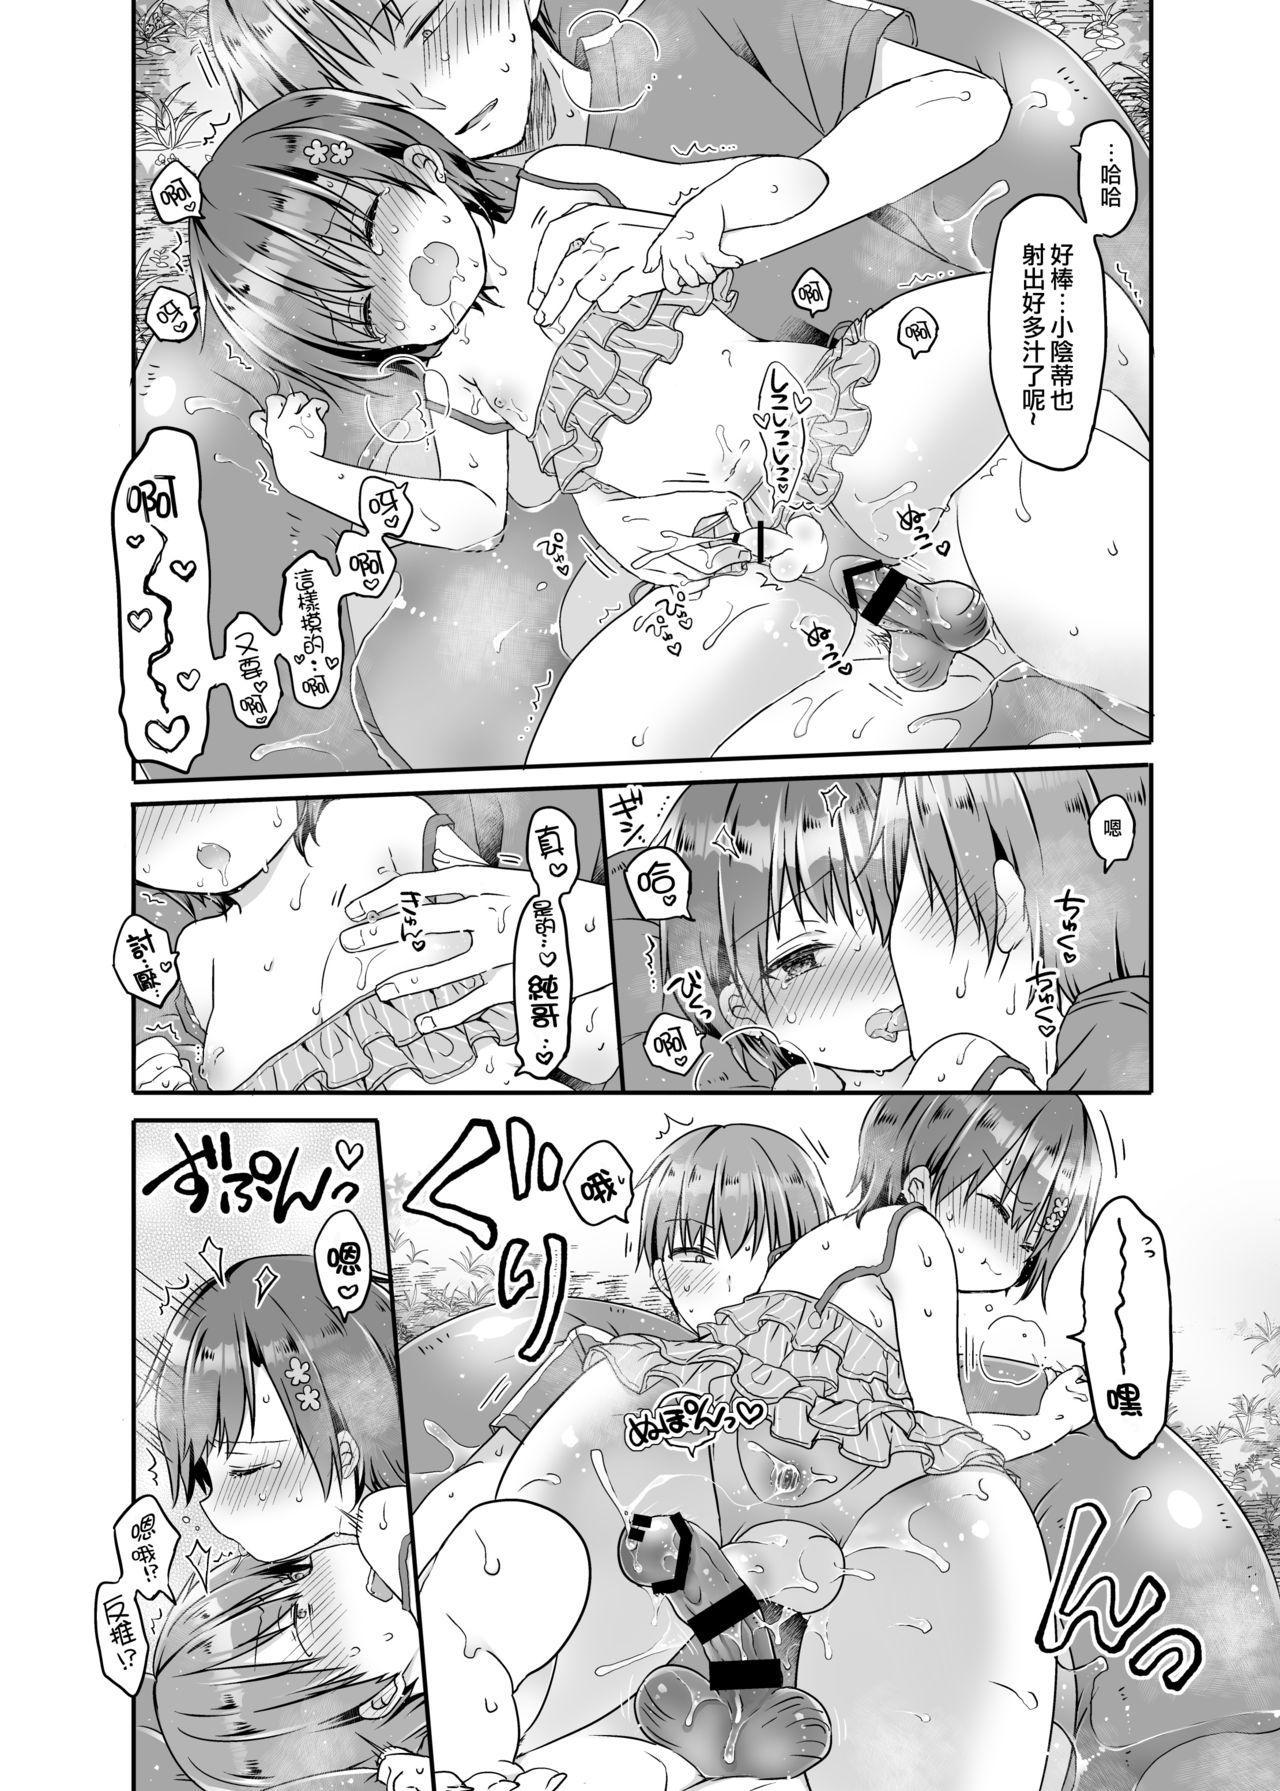 Totsugeki! Rinka no Josou Shounen 5 Ouchi de Mizugi Hen 24